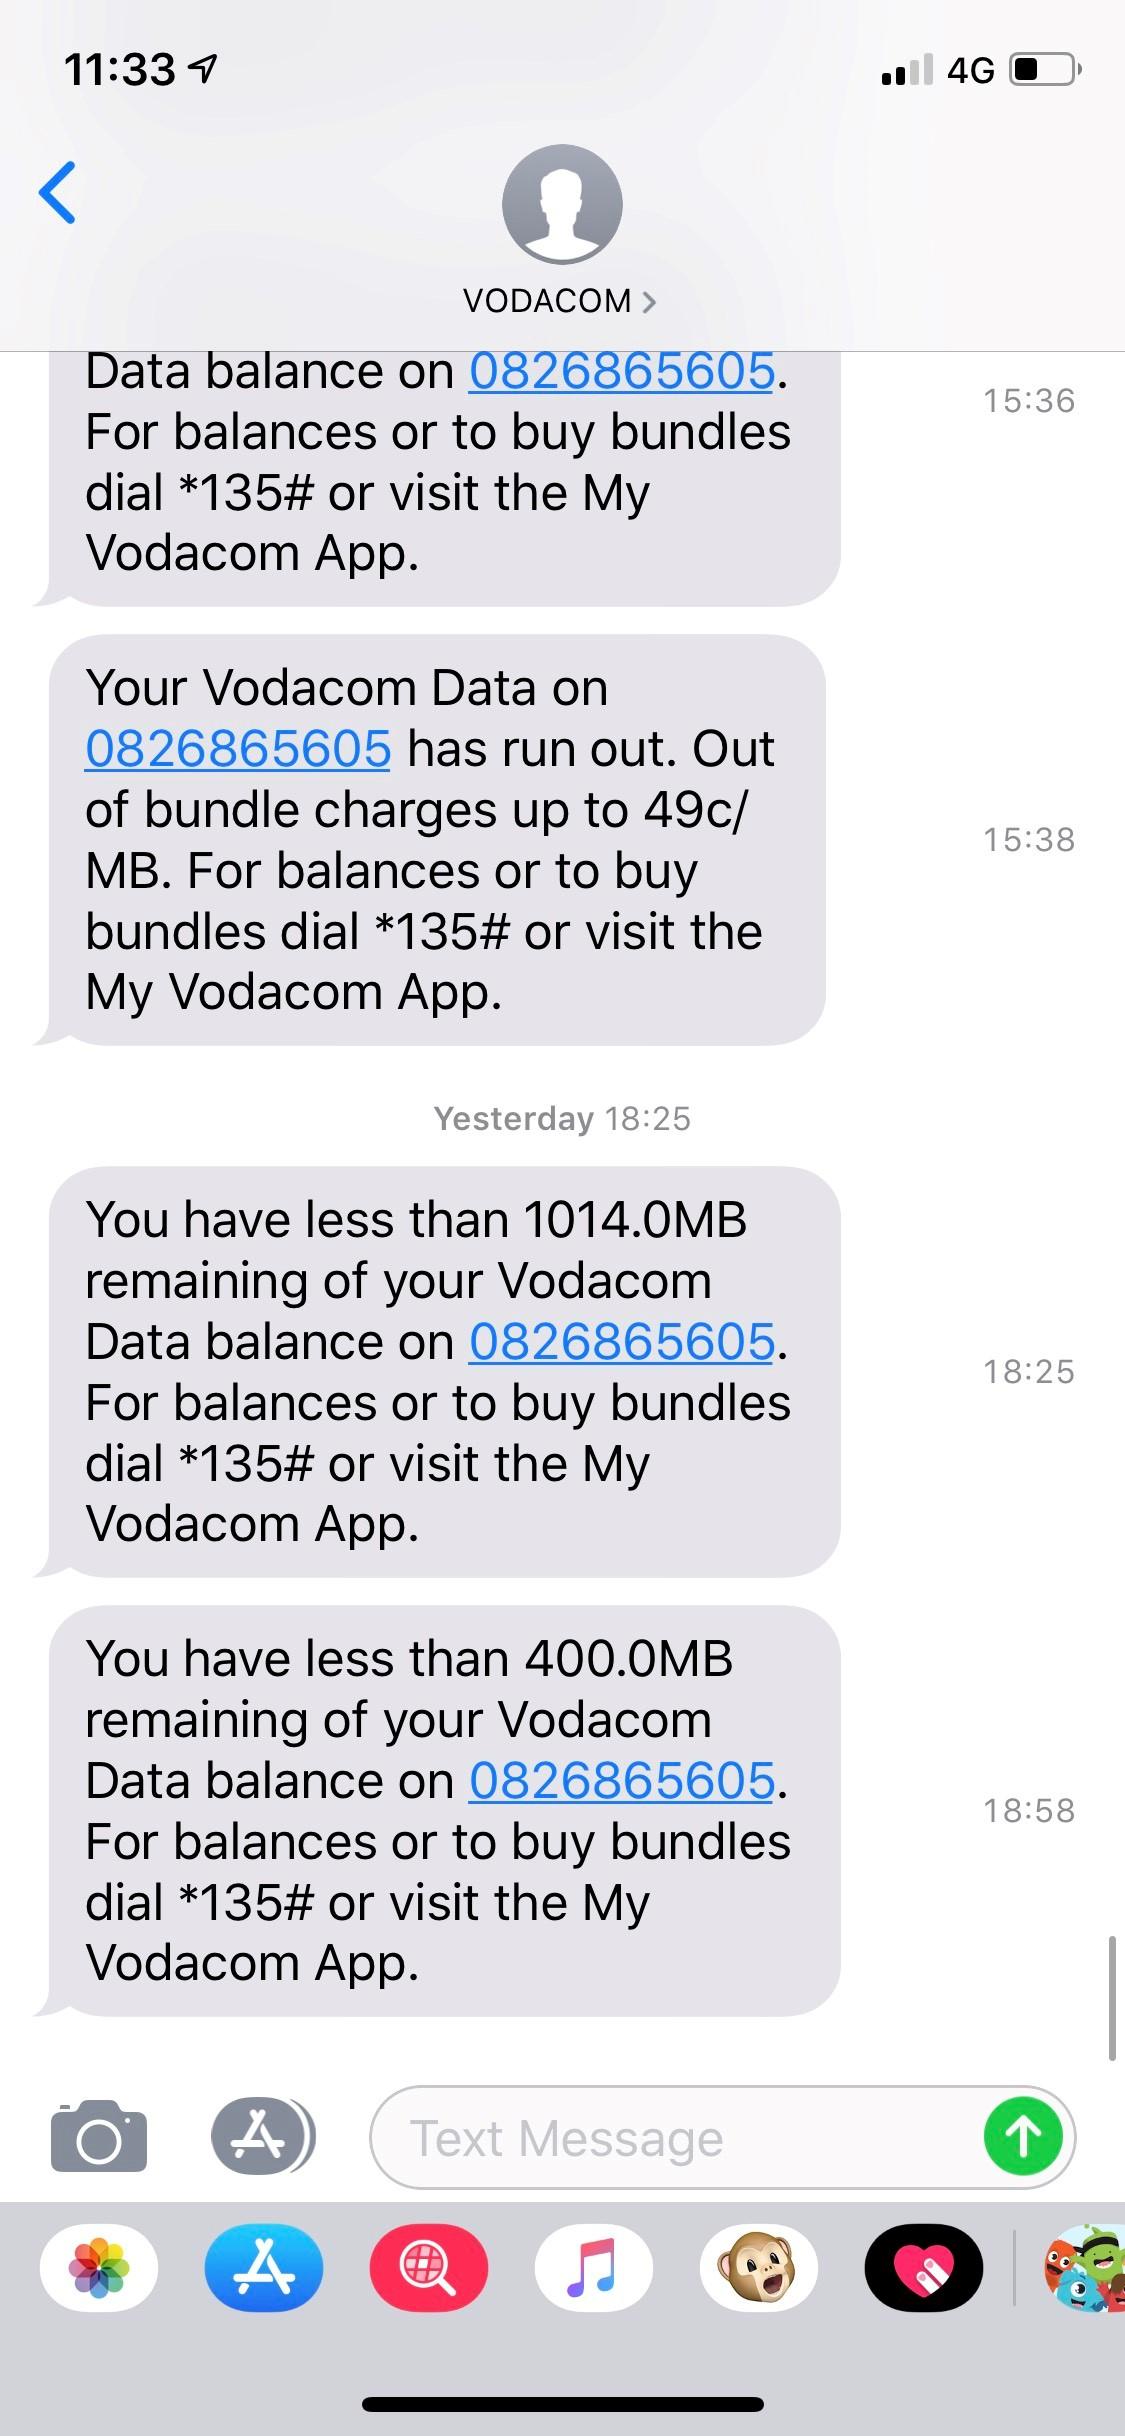 Vodacom Customer Service Complaints Department | HissingKitty com